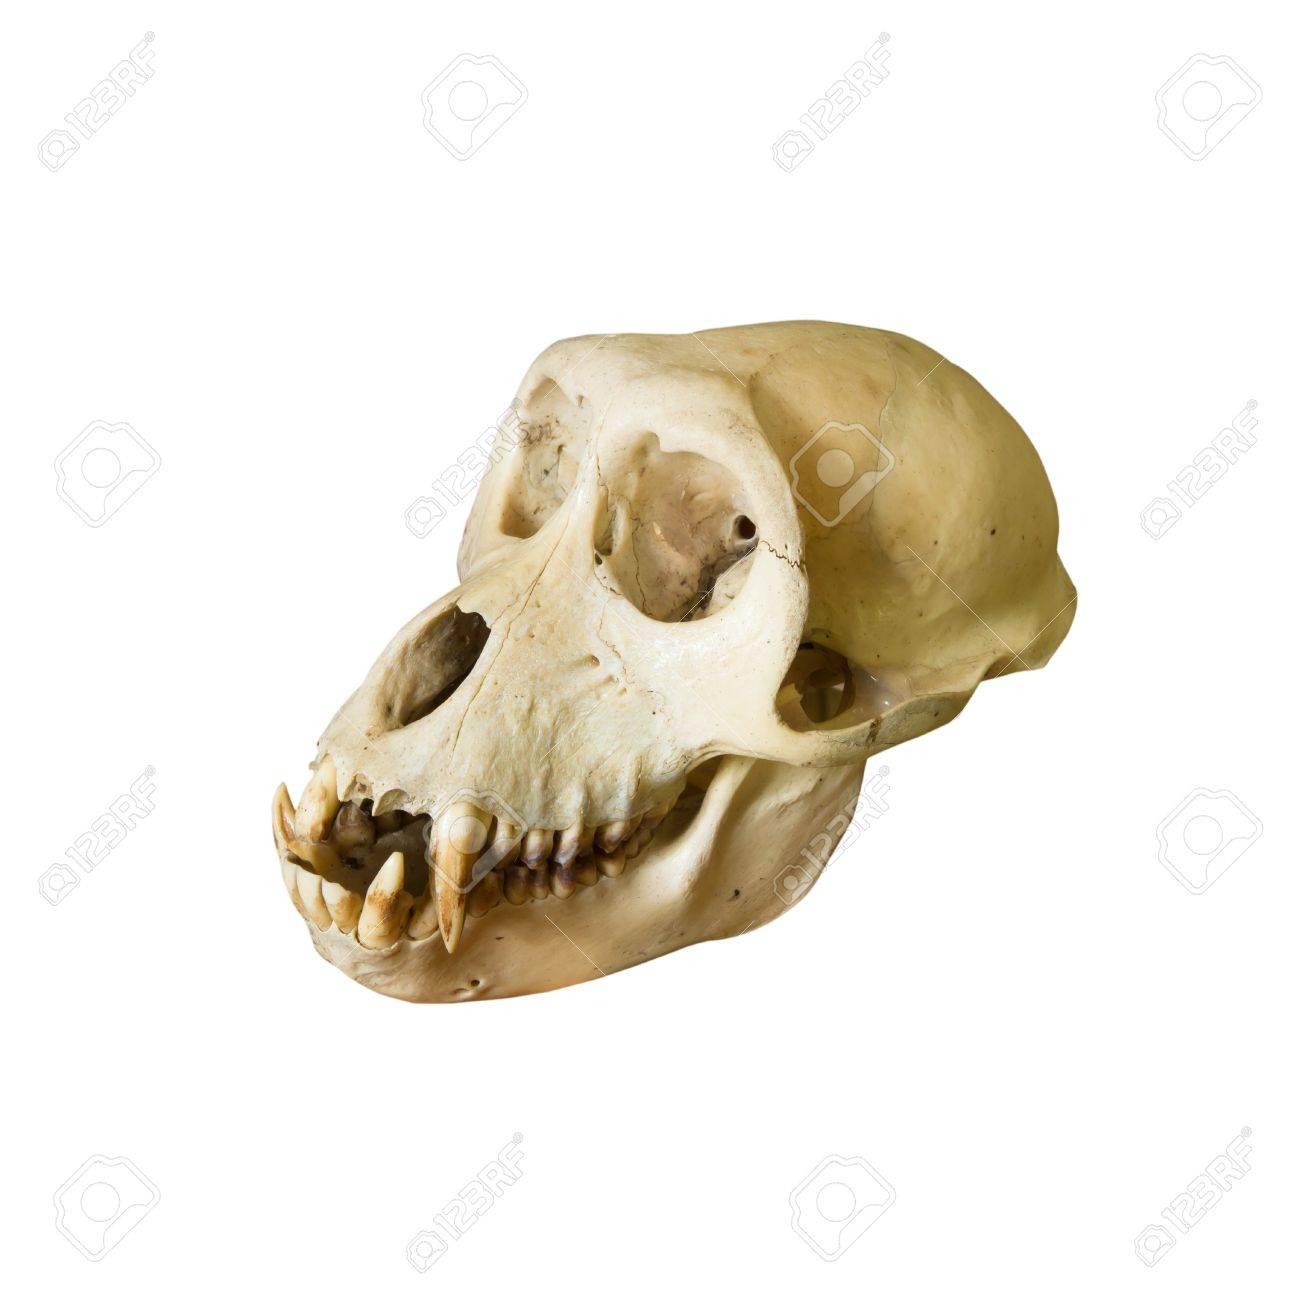 Monkey skulls Stock Photo - 16995465